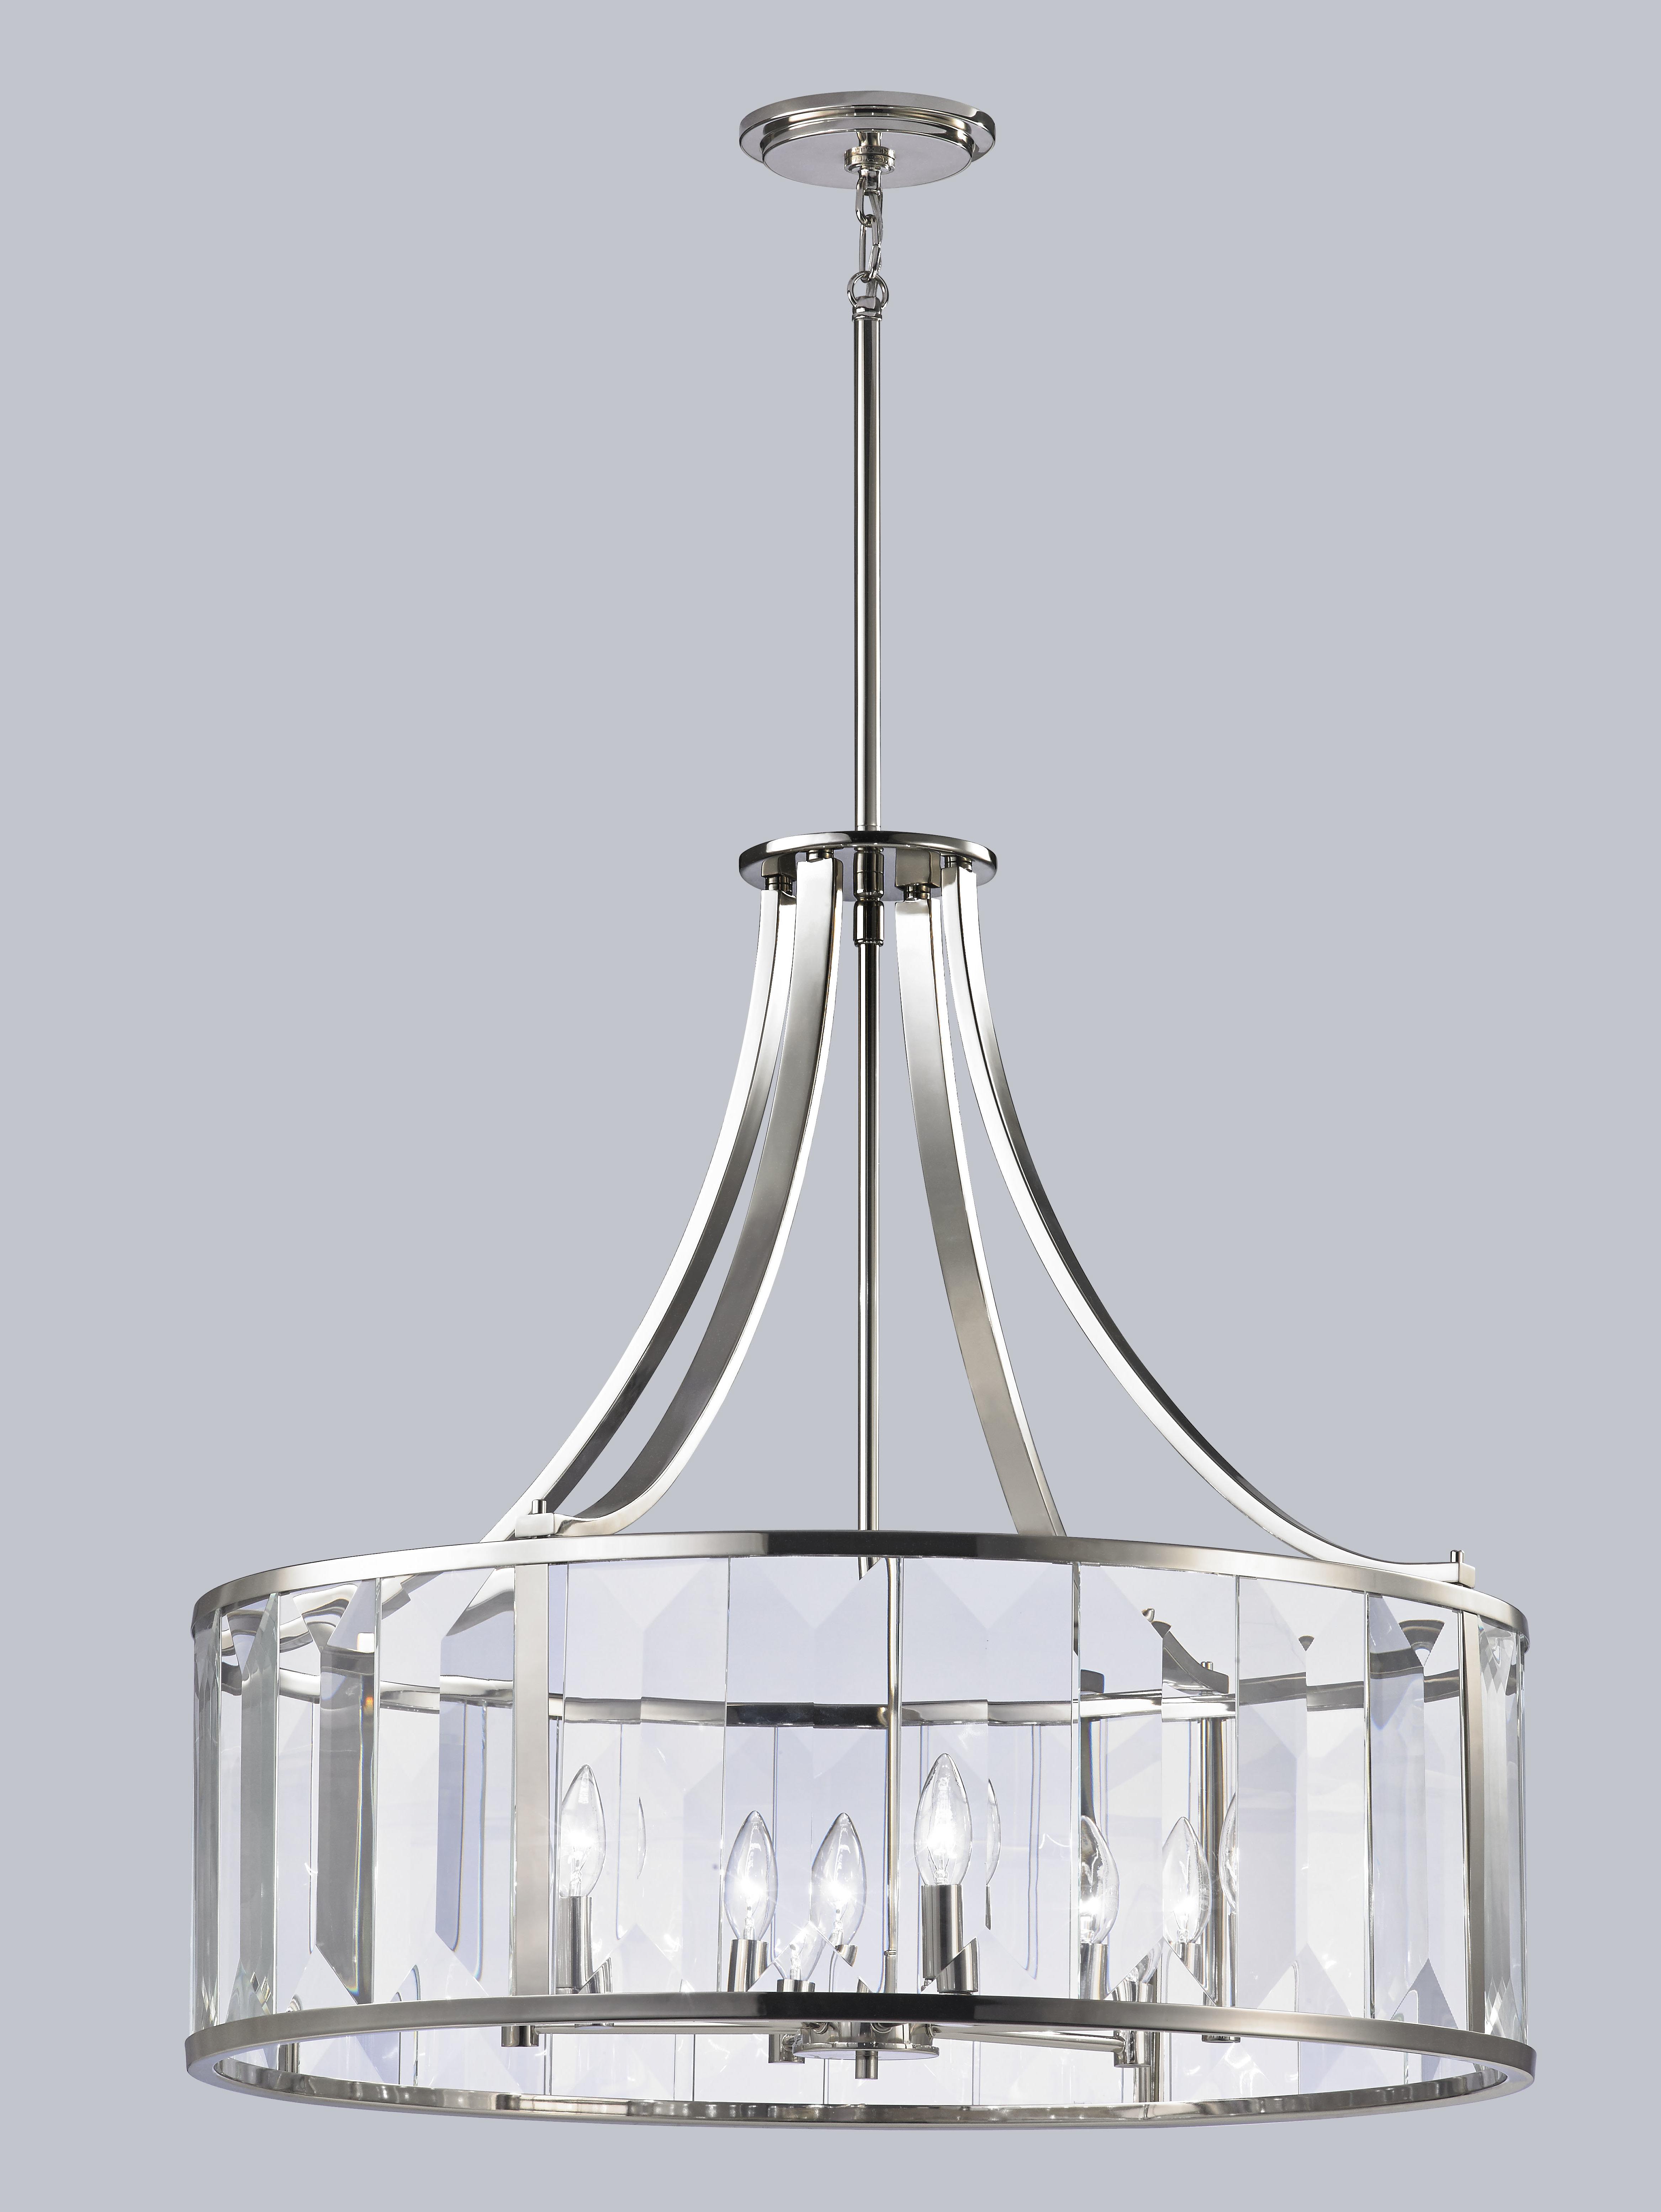 House Of Hampton Sylvia 6 Light Lantern Pendant Intended For Fashionable Nisbet 4 Light Lantern Geometric Pendants (View 13 of 25)